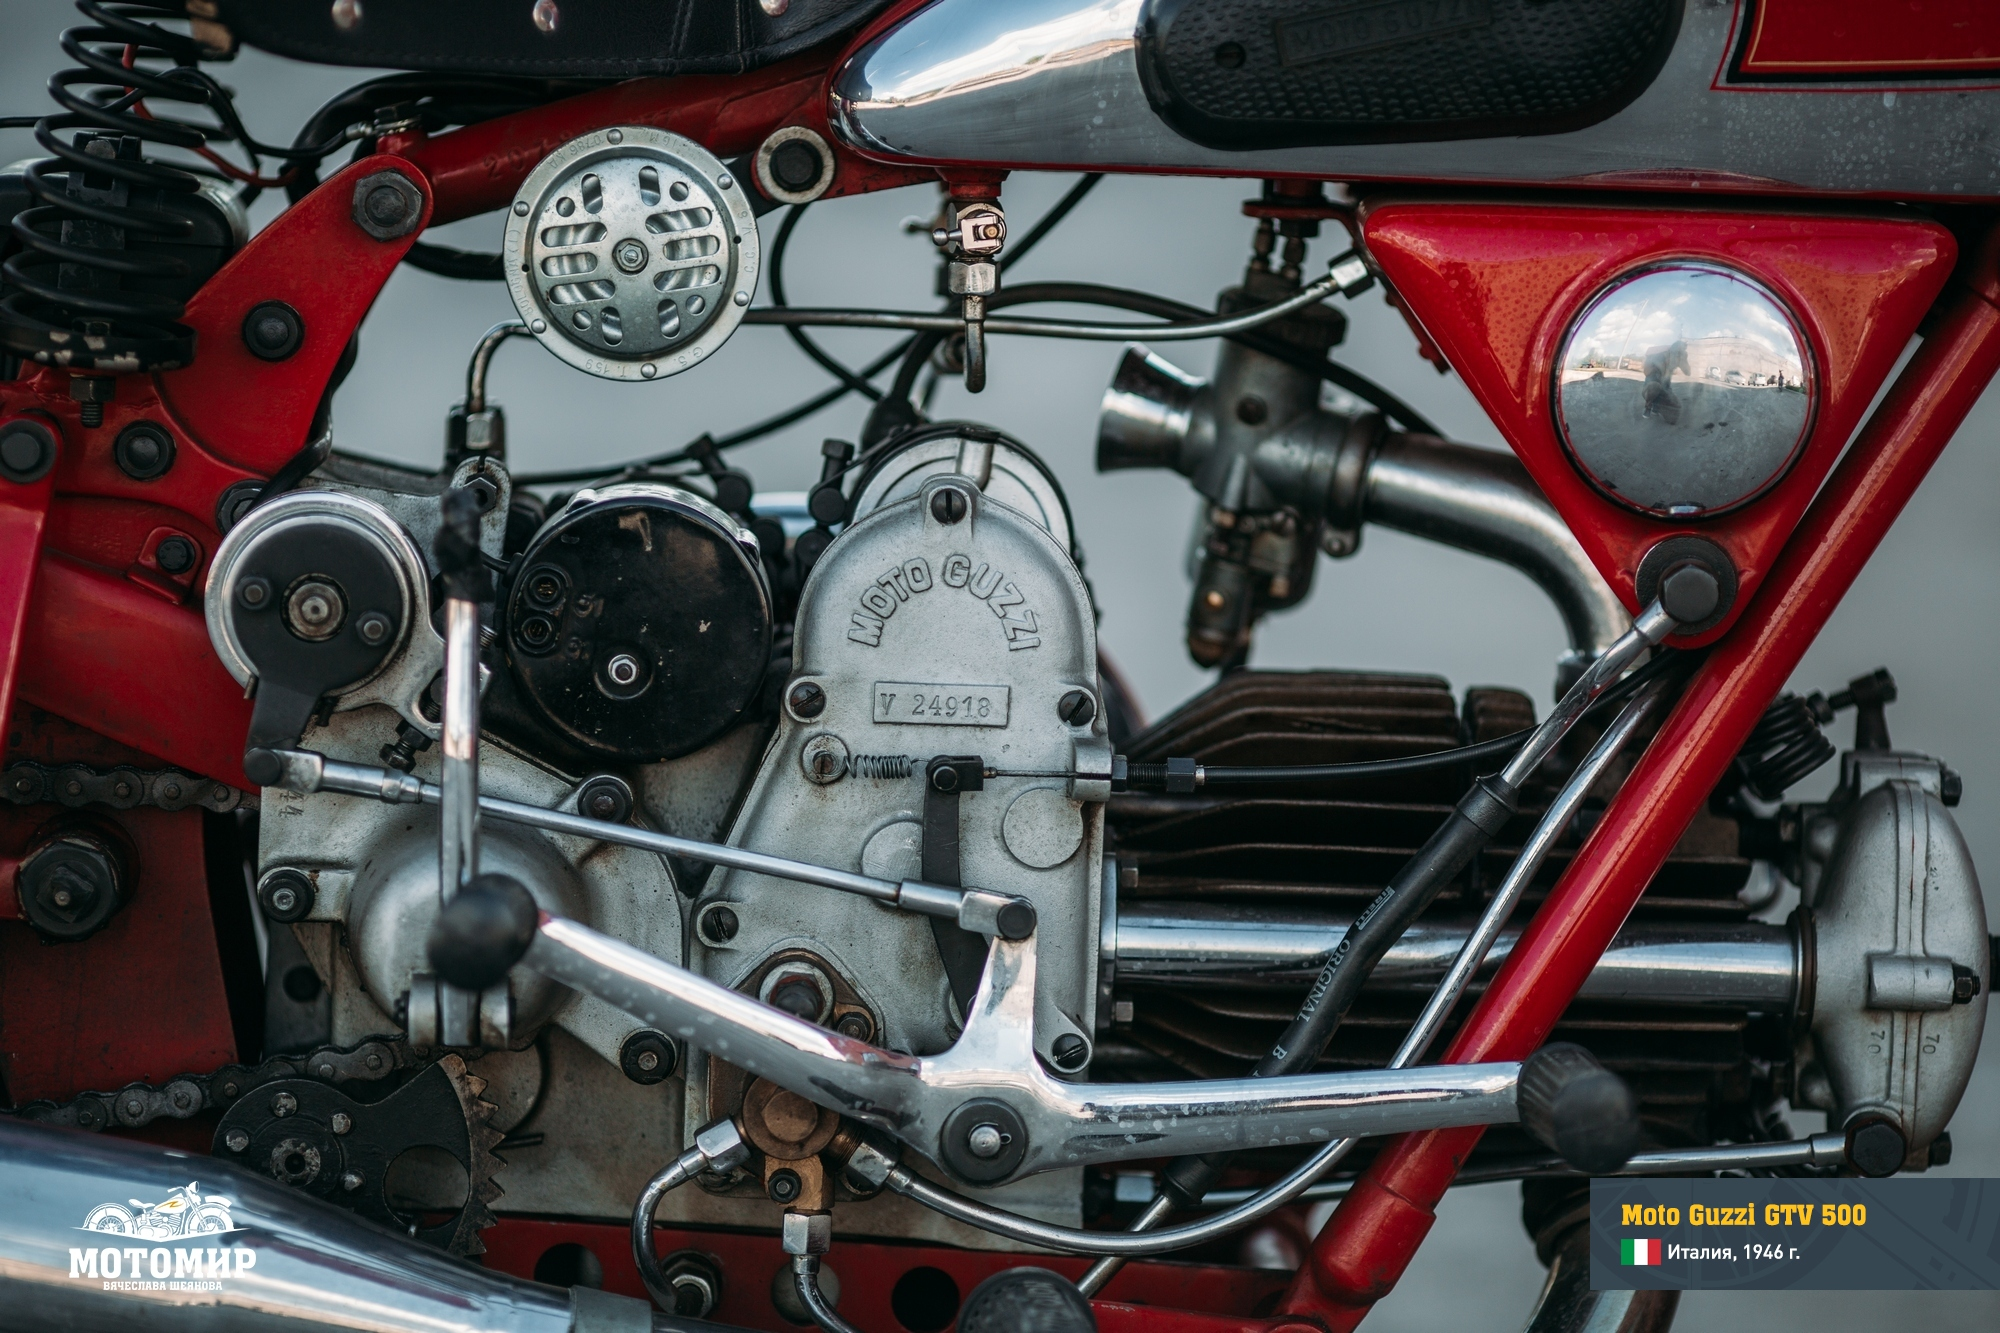 moto-guzzi-gtv-500-201509-web-10